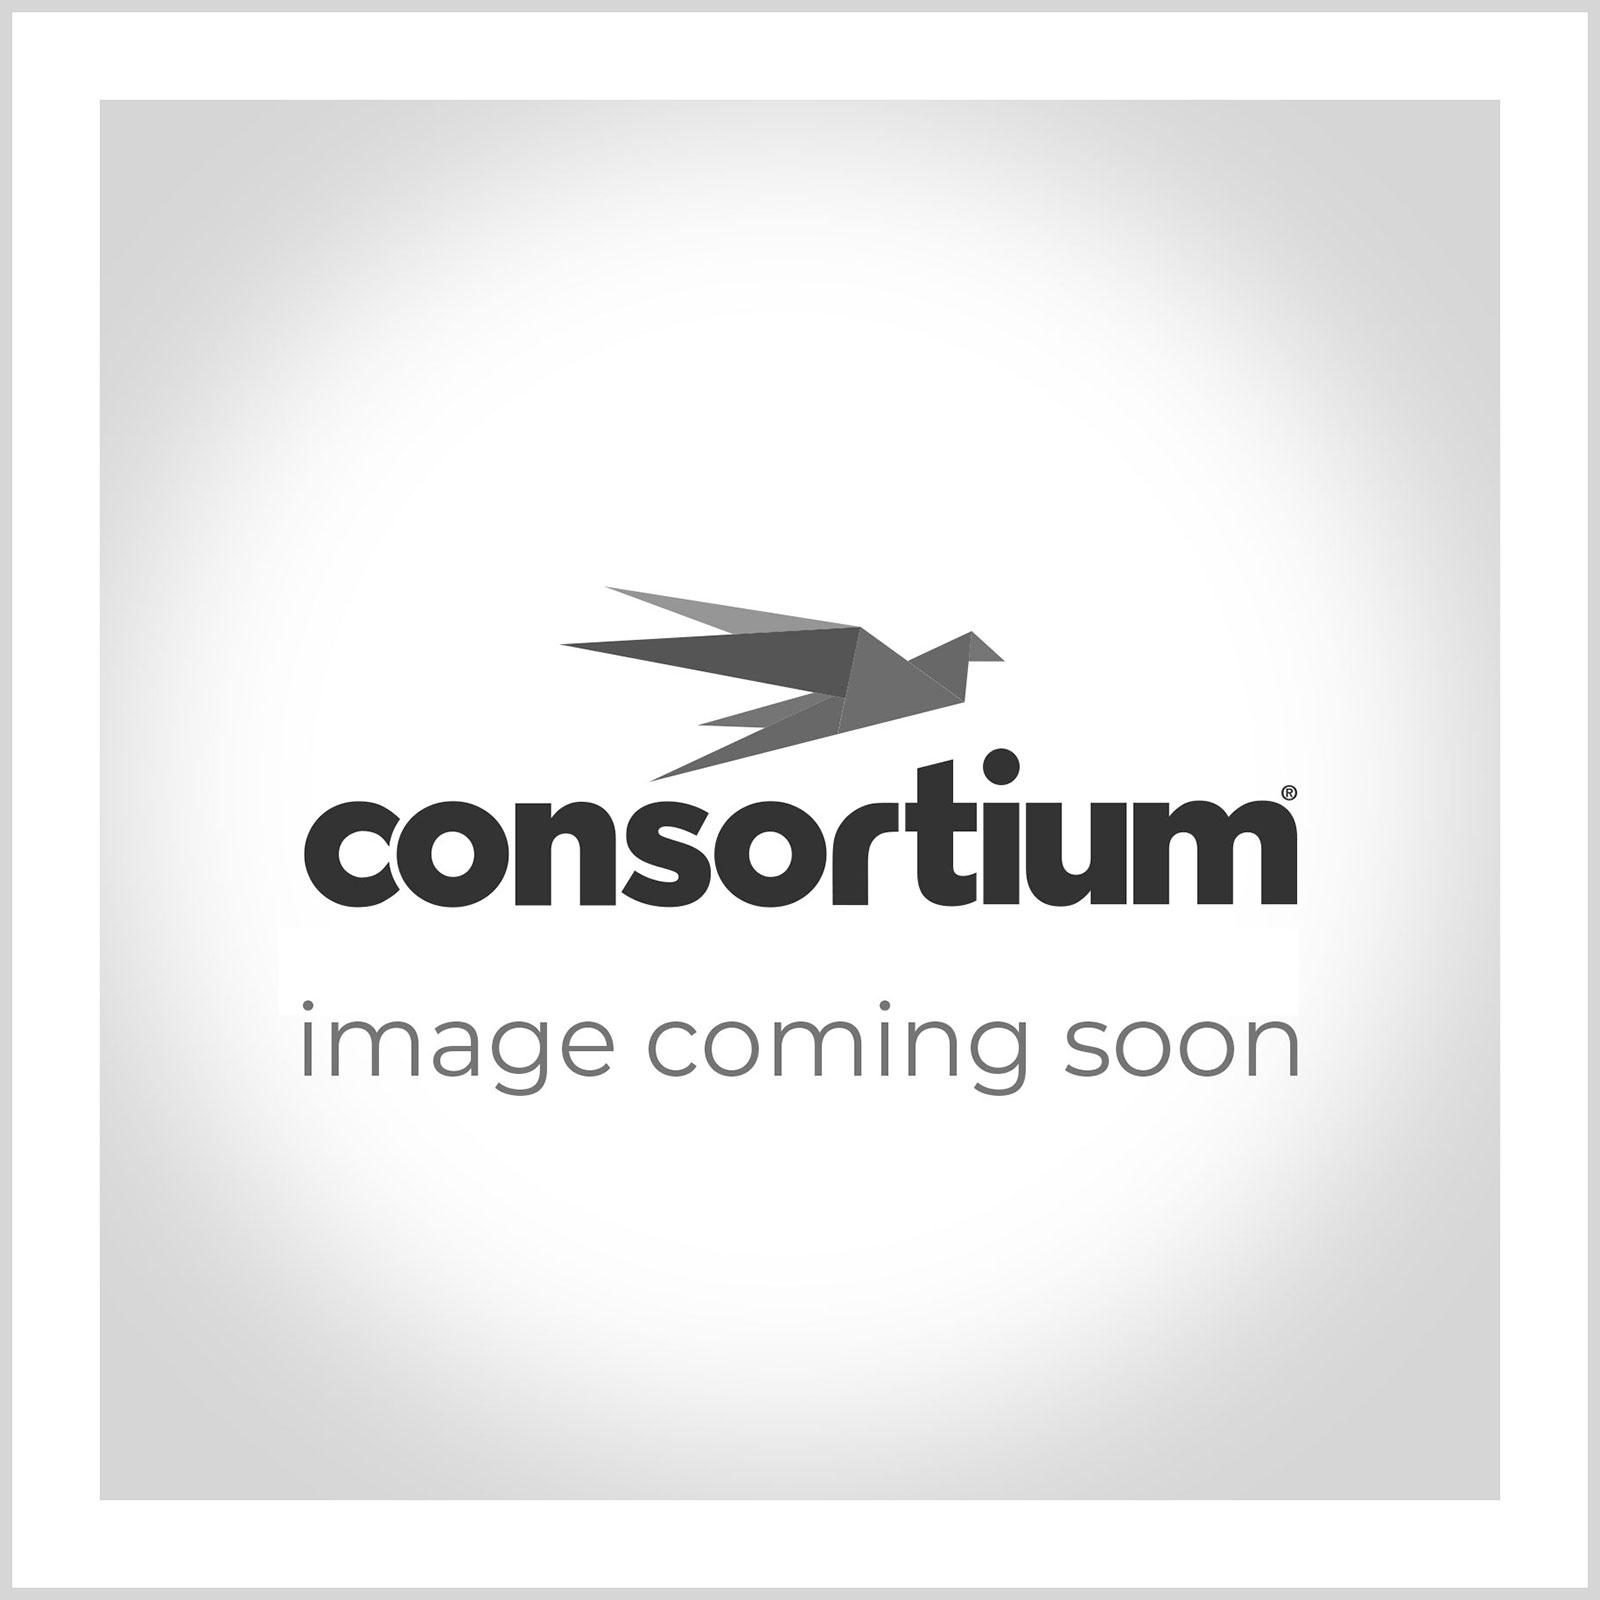 Consortium Scalloped Fade Resistant Corrugated Borders